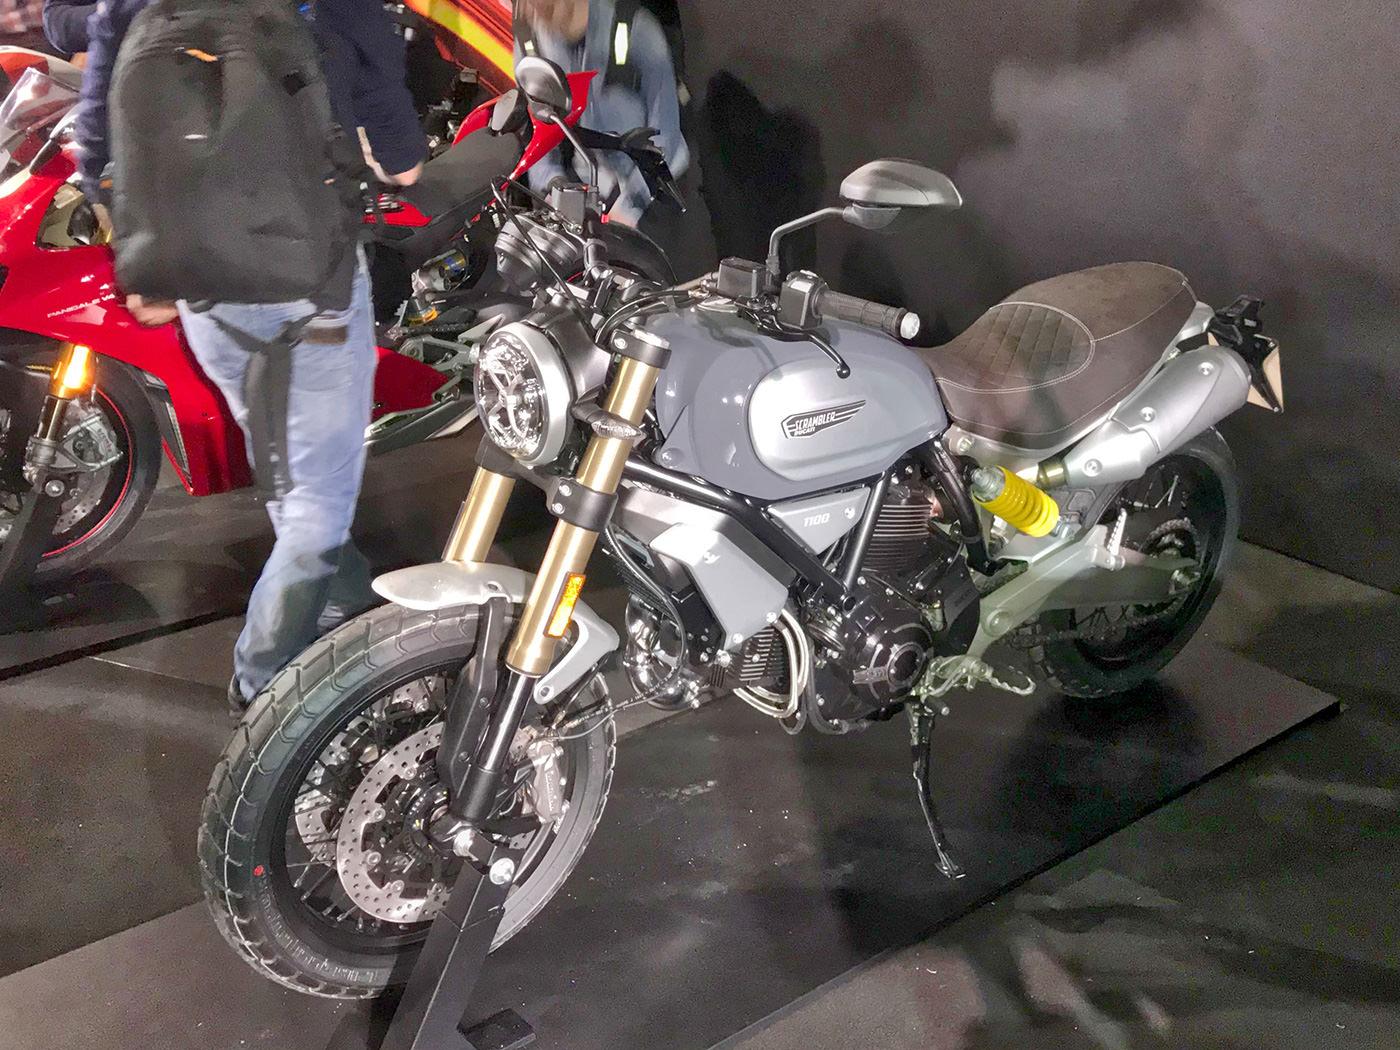 Ducati Scrambler si fa grande e arriva a 1100